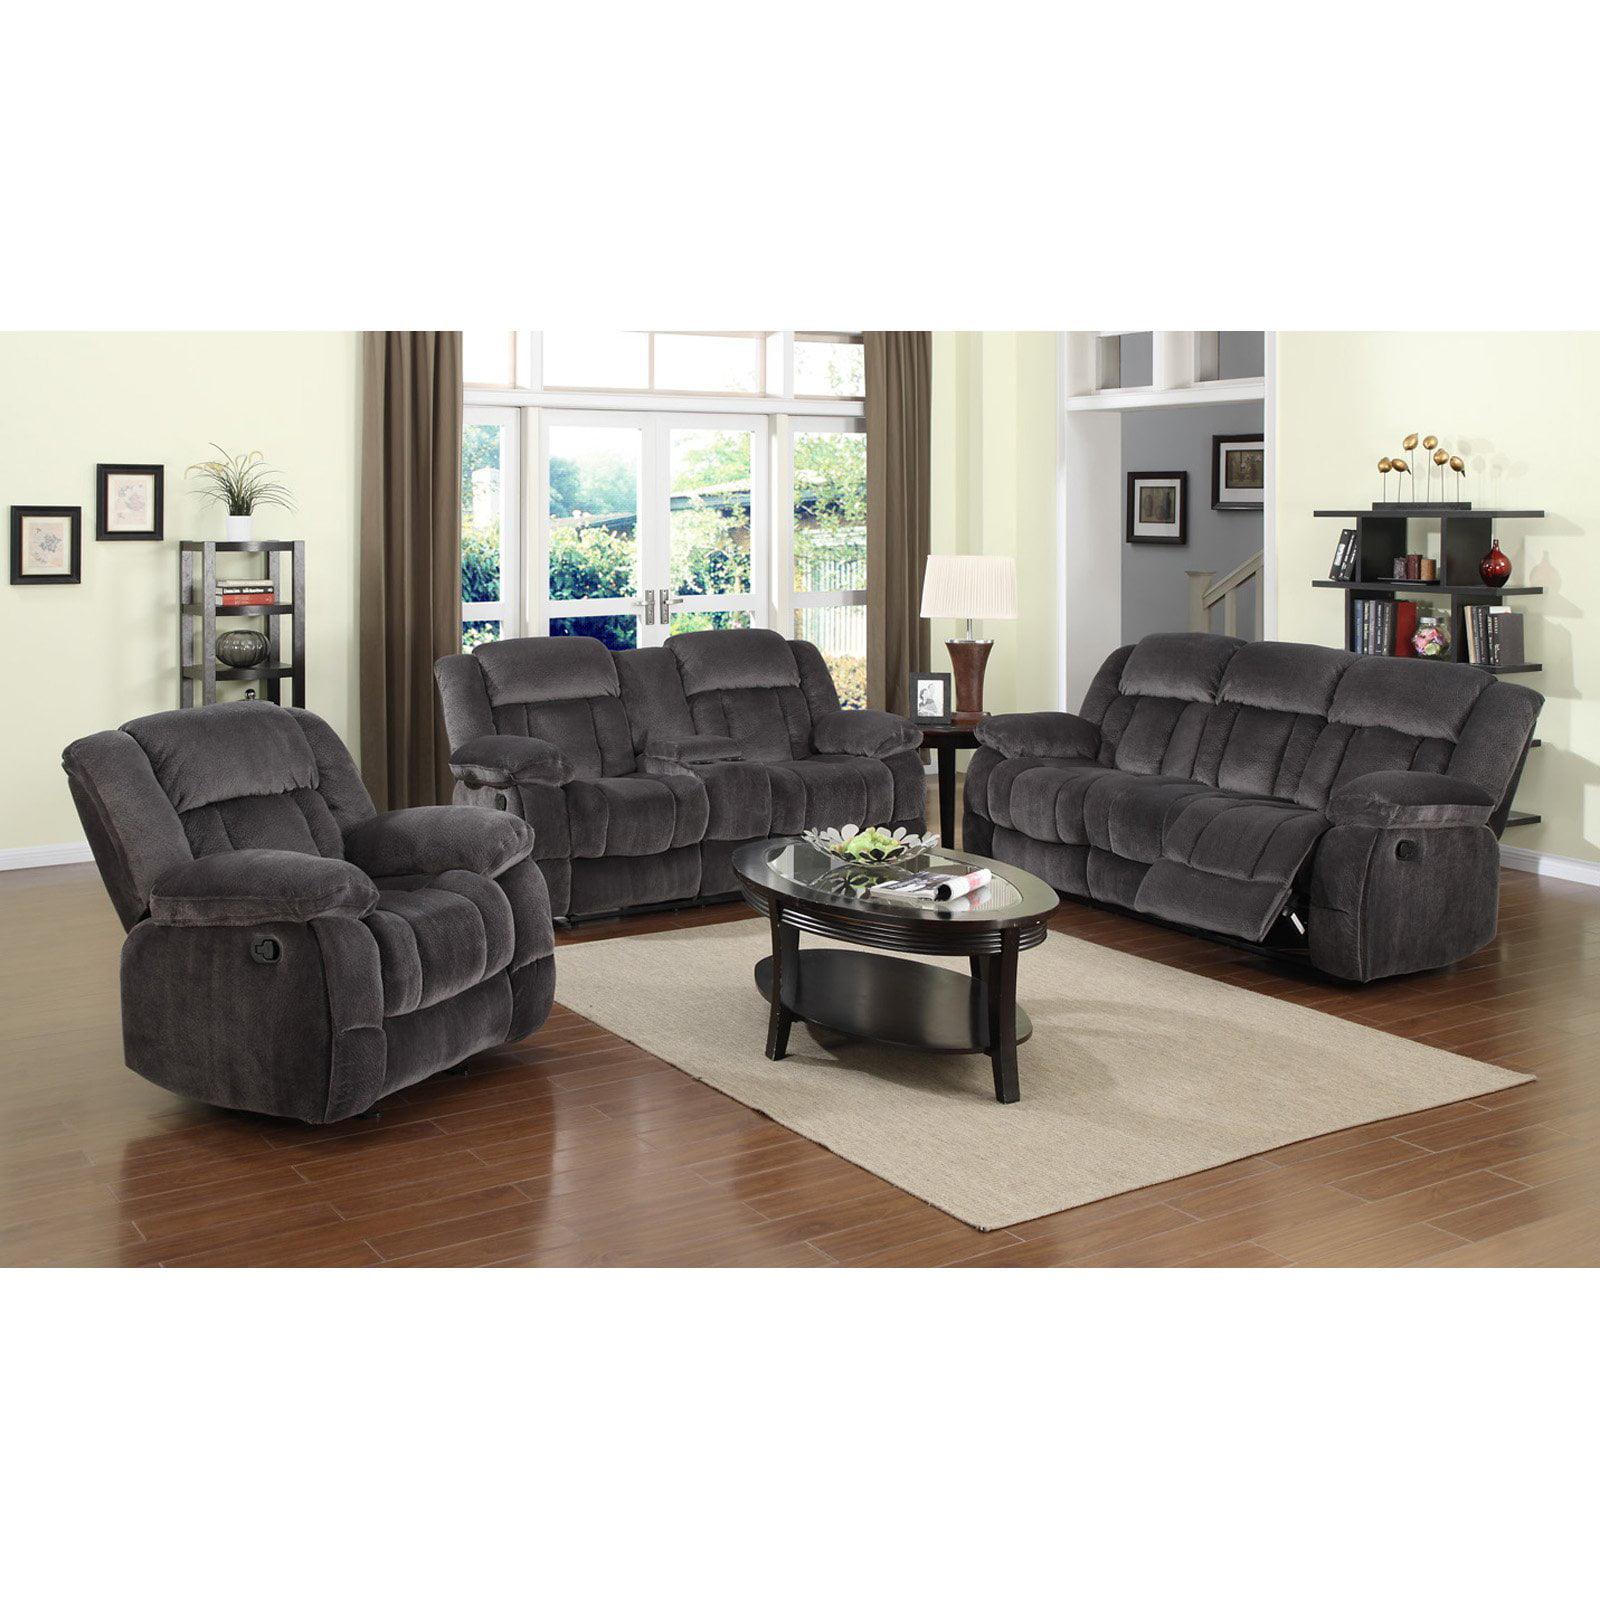 Image of: Sunset Trading Madison 3 Piece Reclining Living Room Set Charcoal Blue Gray Walmart Com Walmart Com